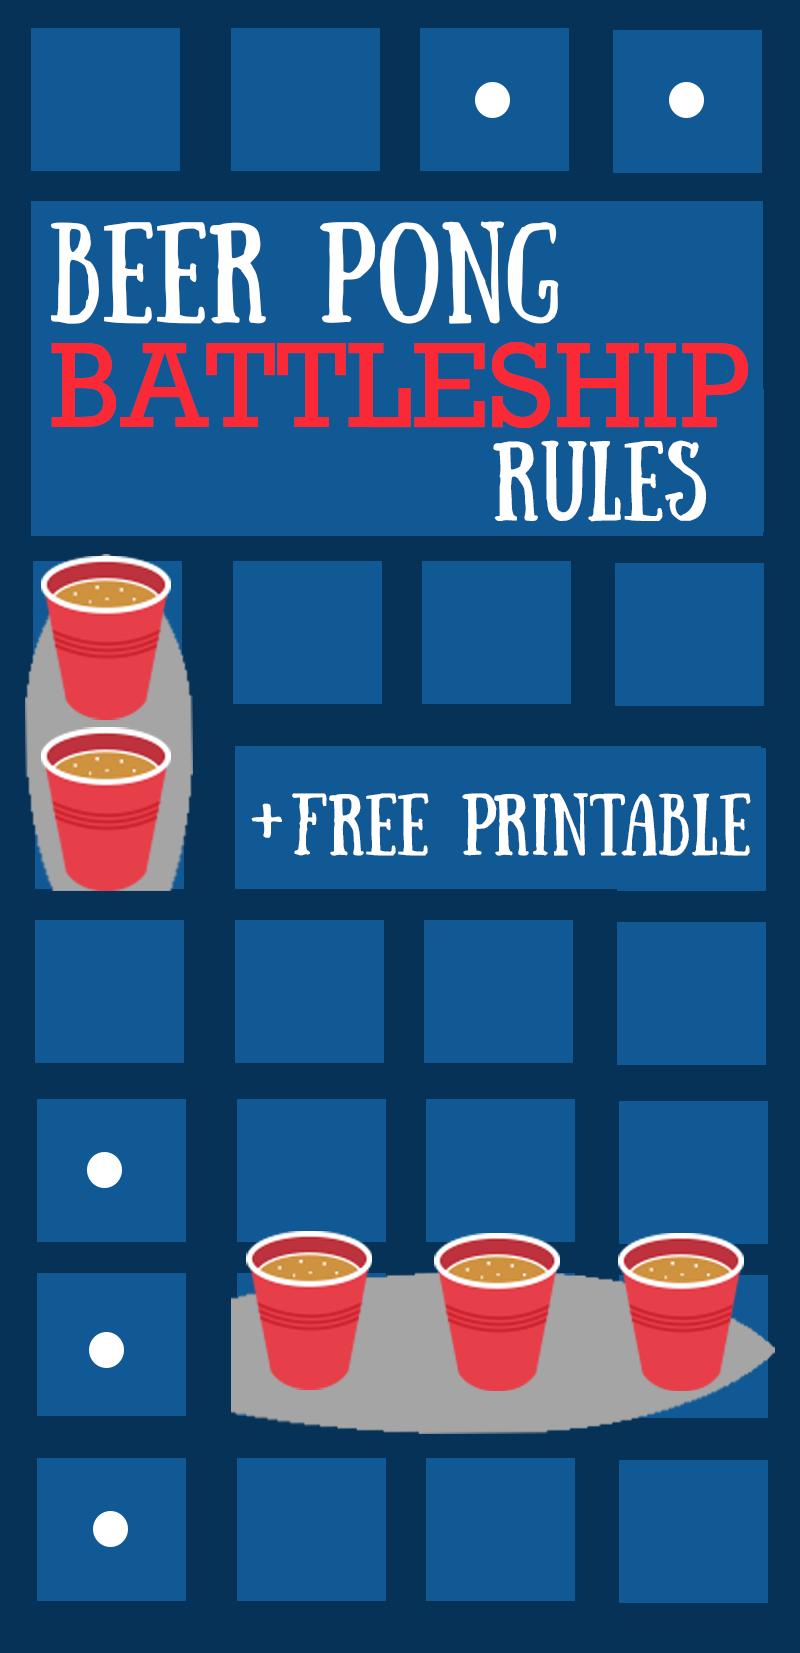 How To Play Battleship Beer Pong AKA Battle Shots